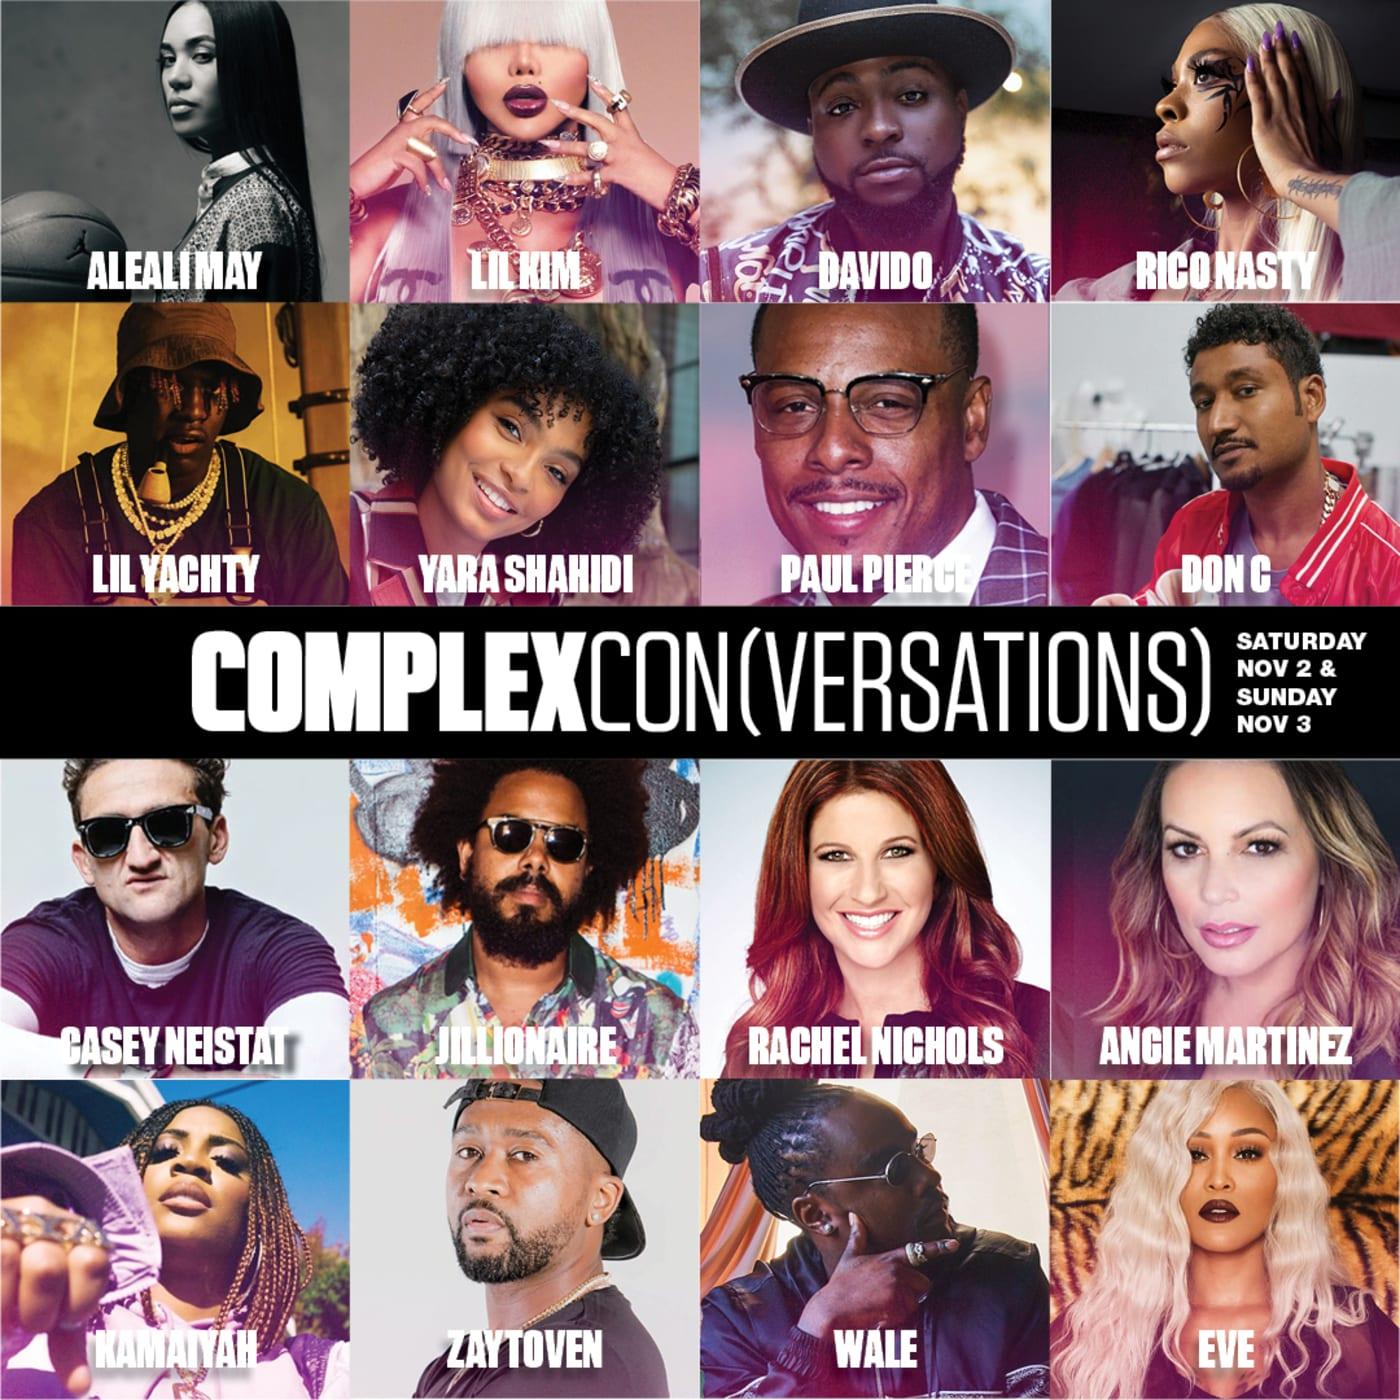 ComplexConversations 2019 Long Beach